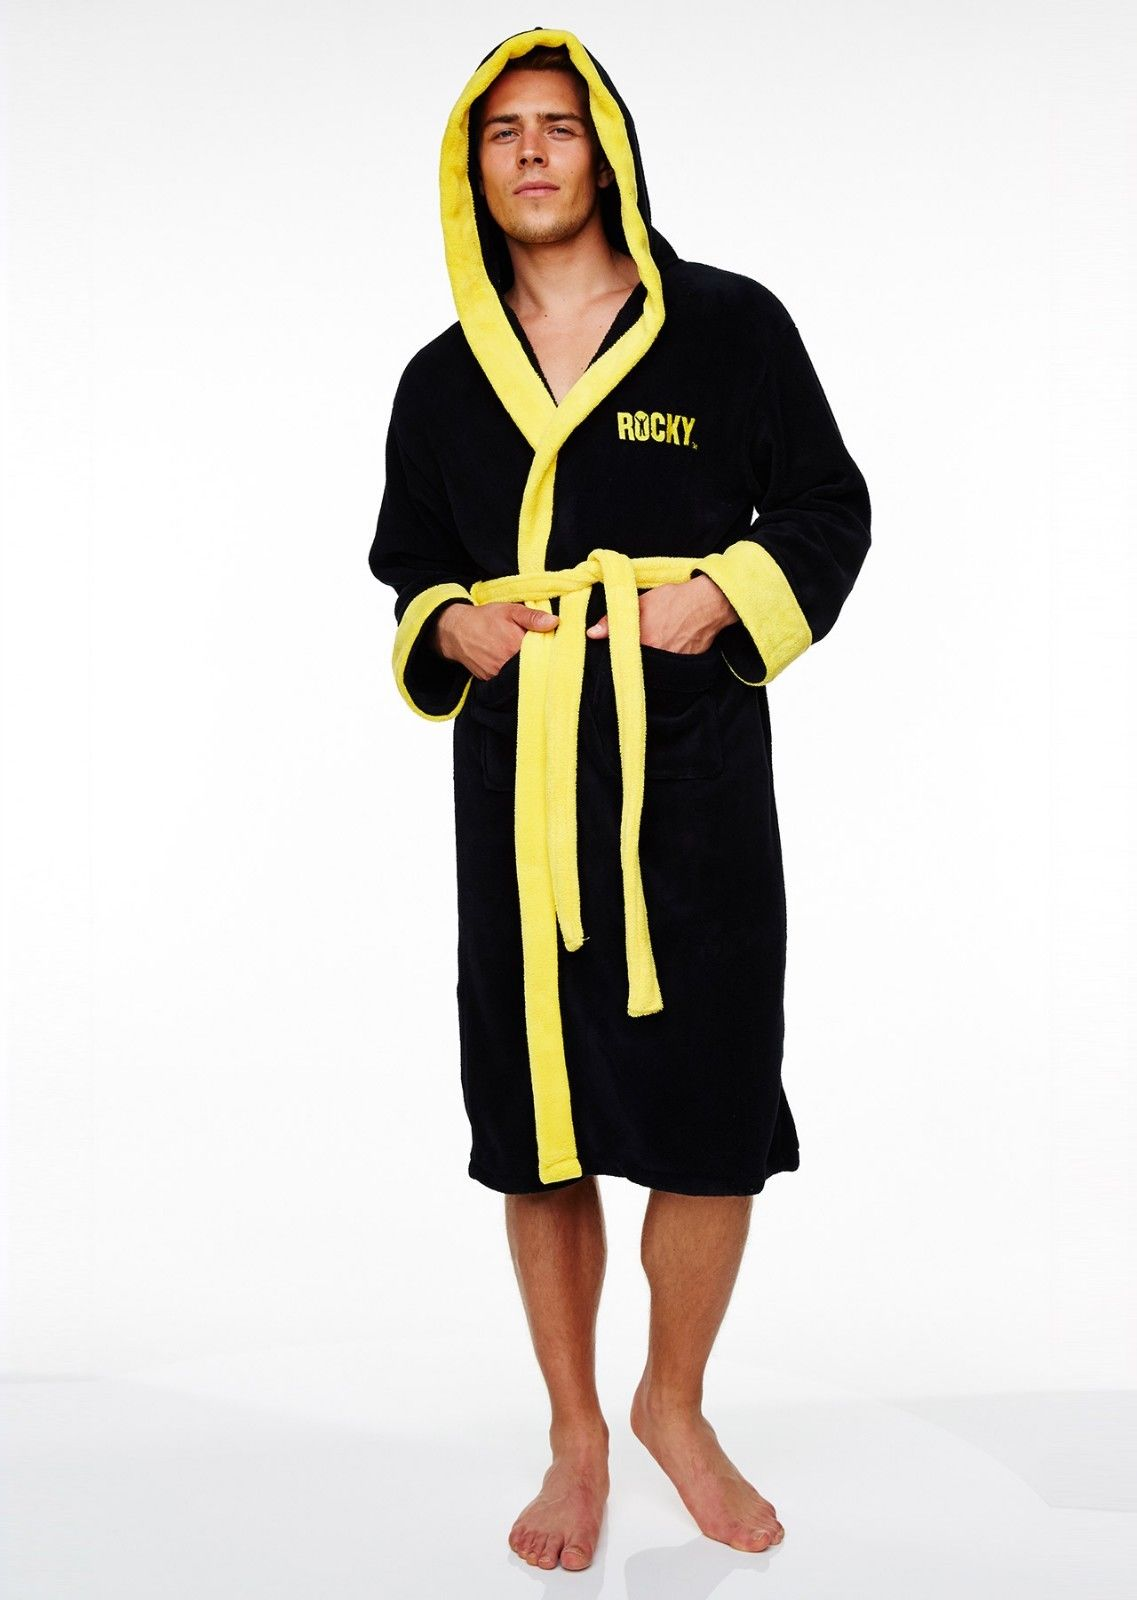 Rocky Italian Stallion Balboa Boxer Dressing Gown Mens Adult ...